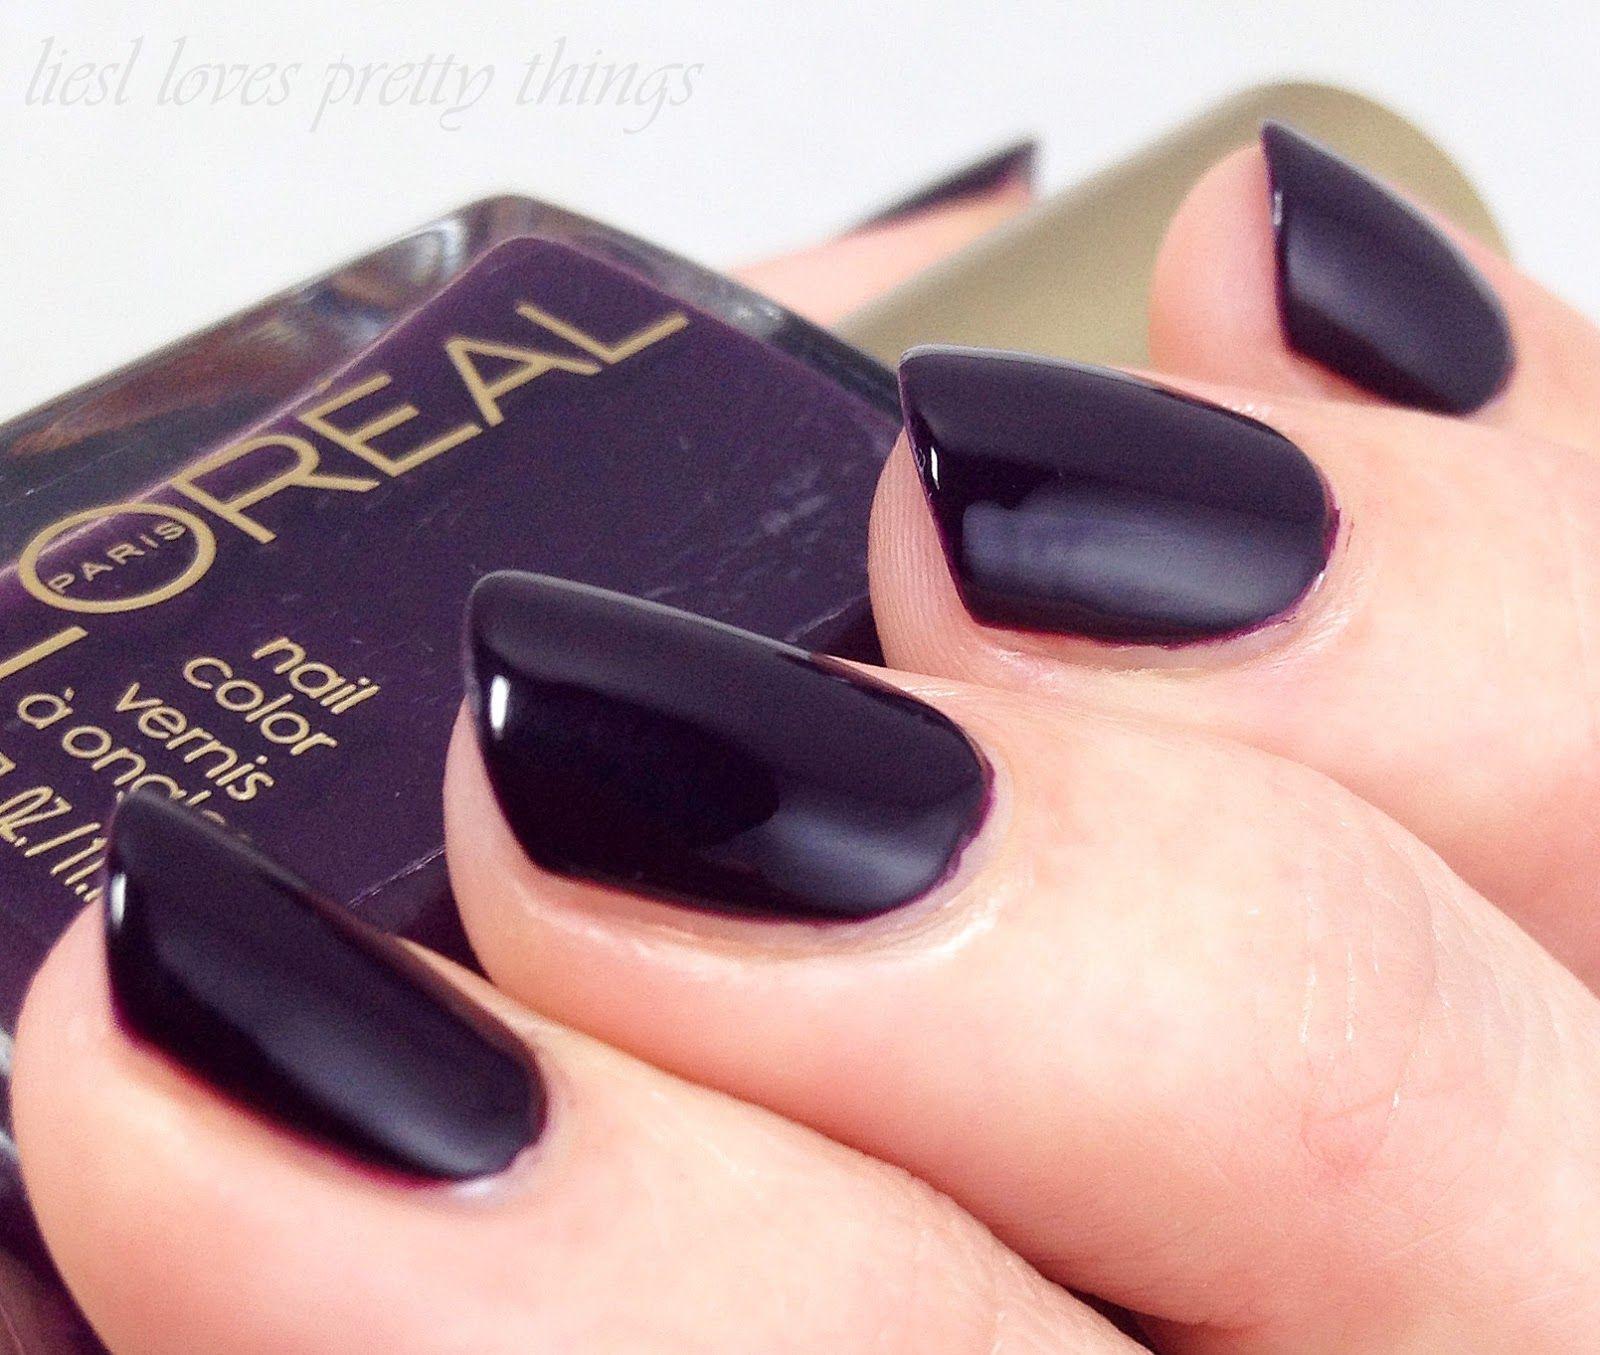 Loreal - Almost Midnight   Nail Polish I Own   Pinterest